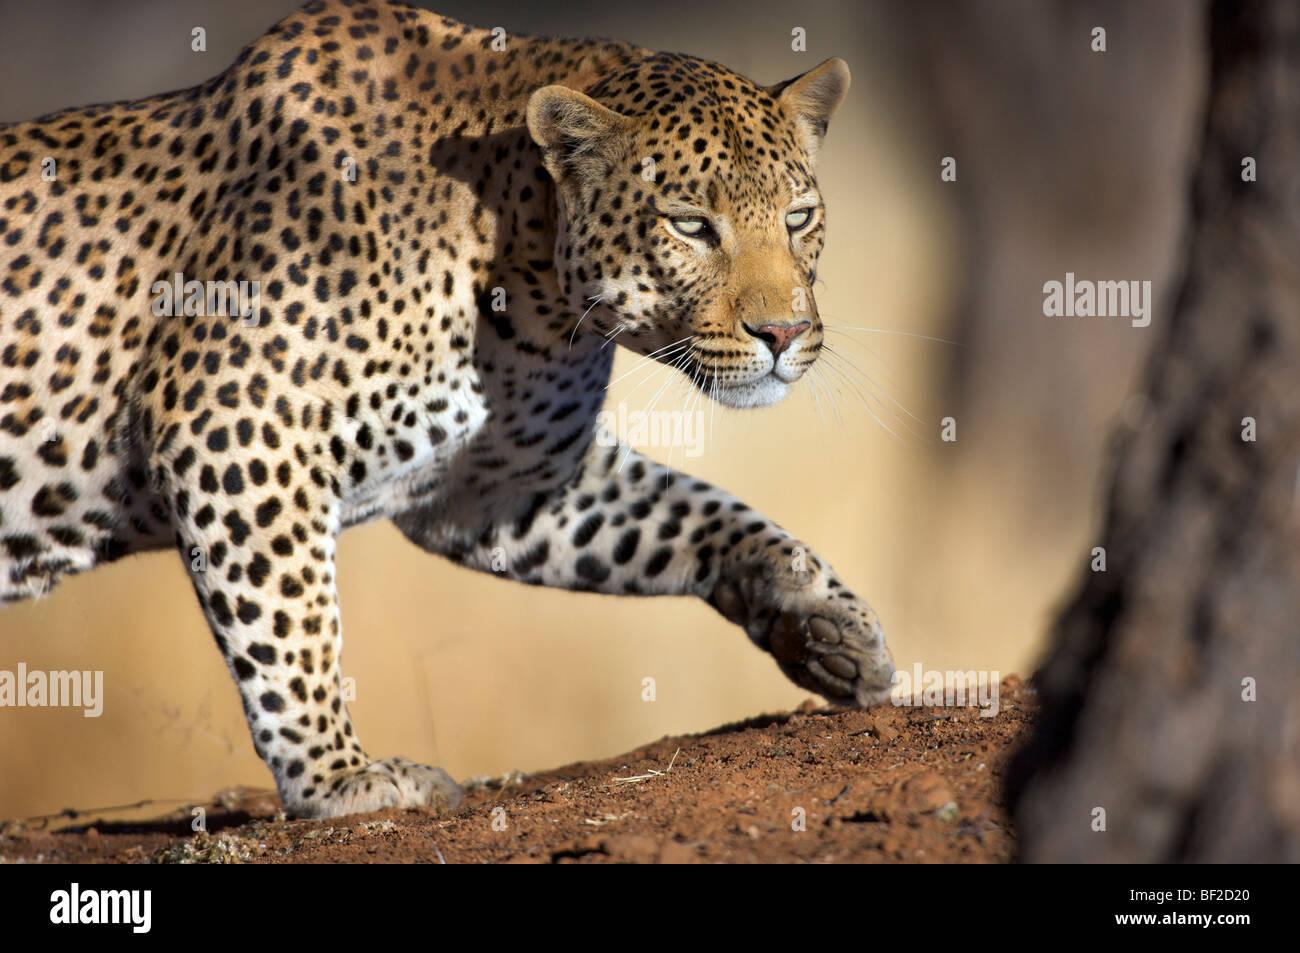 Close up o un ghepardo (Panthera Pardus) stalking,l'Okonjima Lodge e la Fondazione Africat, Namibia Immagini Stock